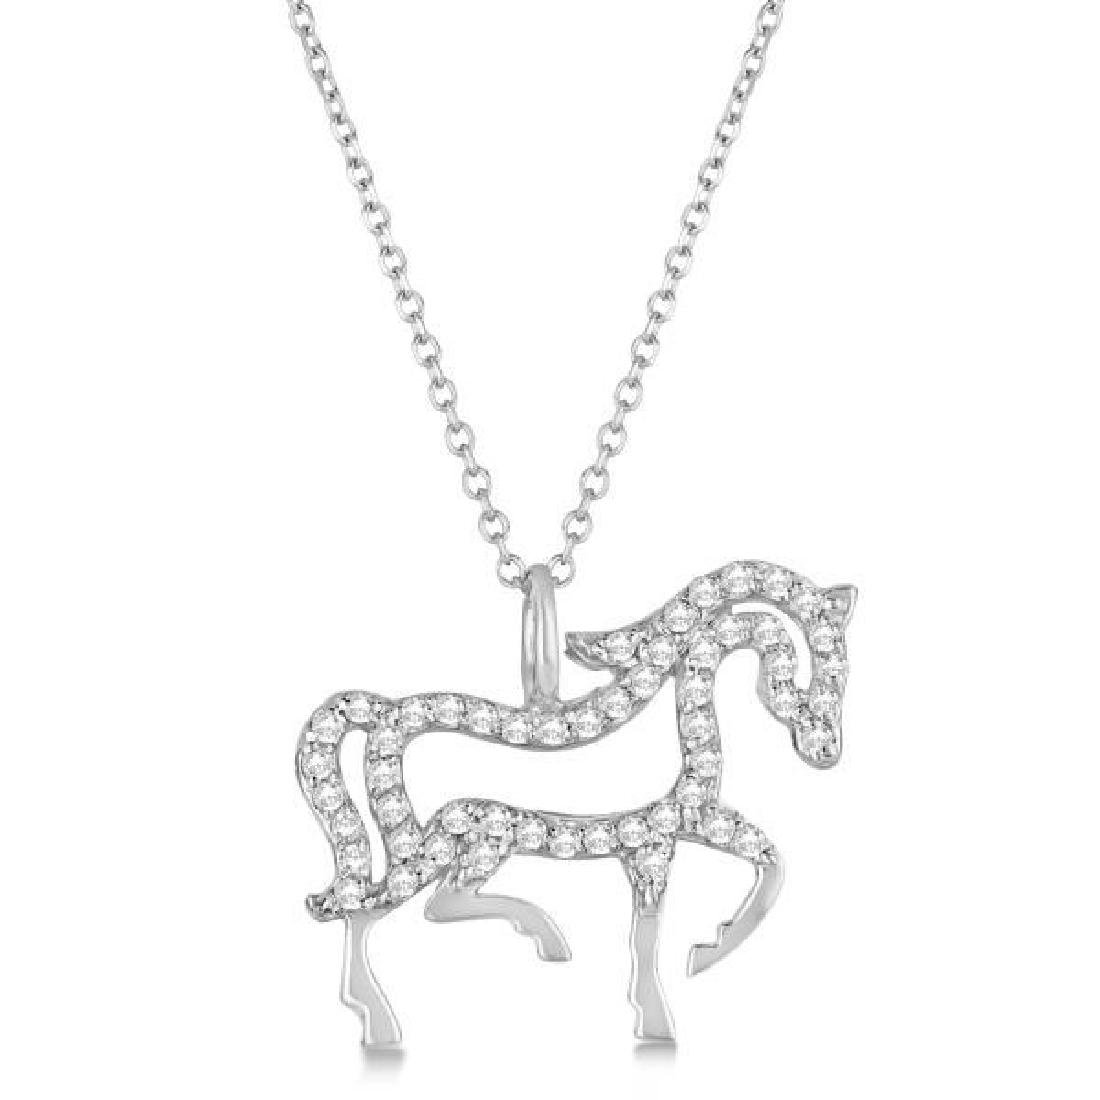 Diamond Galloping Horse Pendant Necklace 4k White Gold